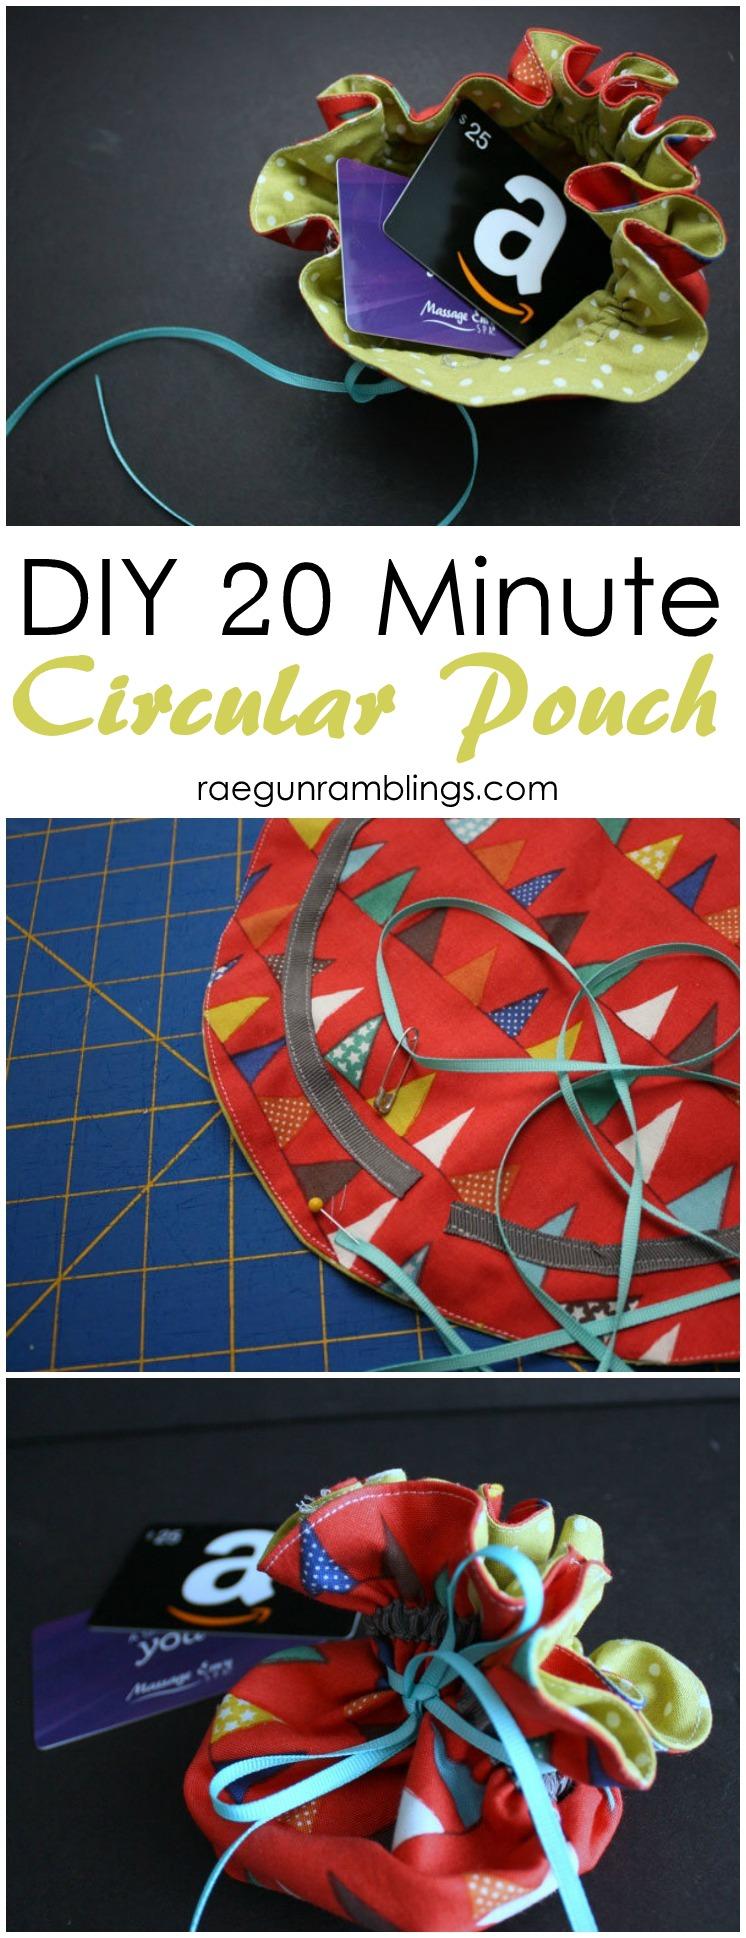 Easy DIY circular pouch tutorial